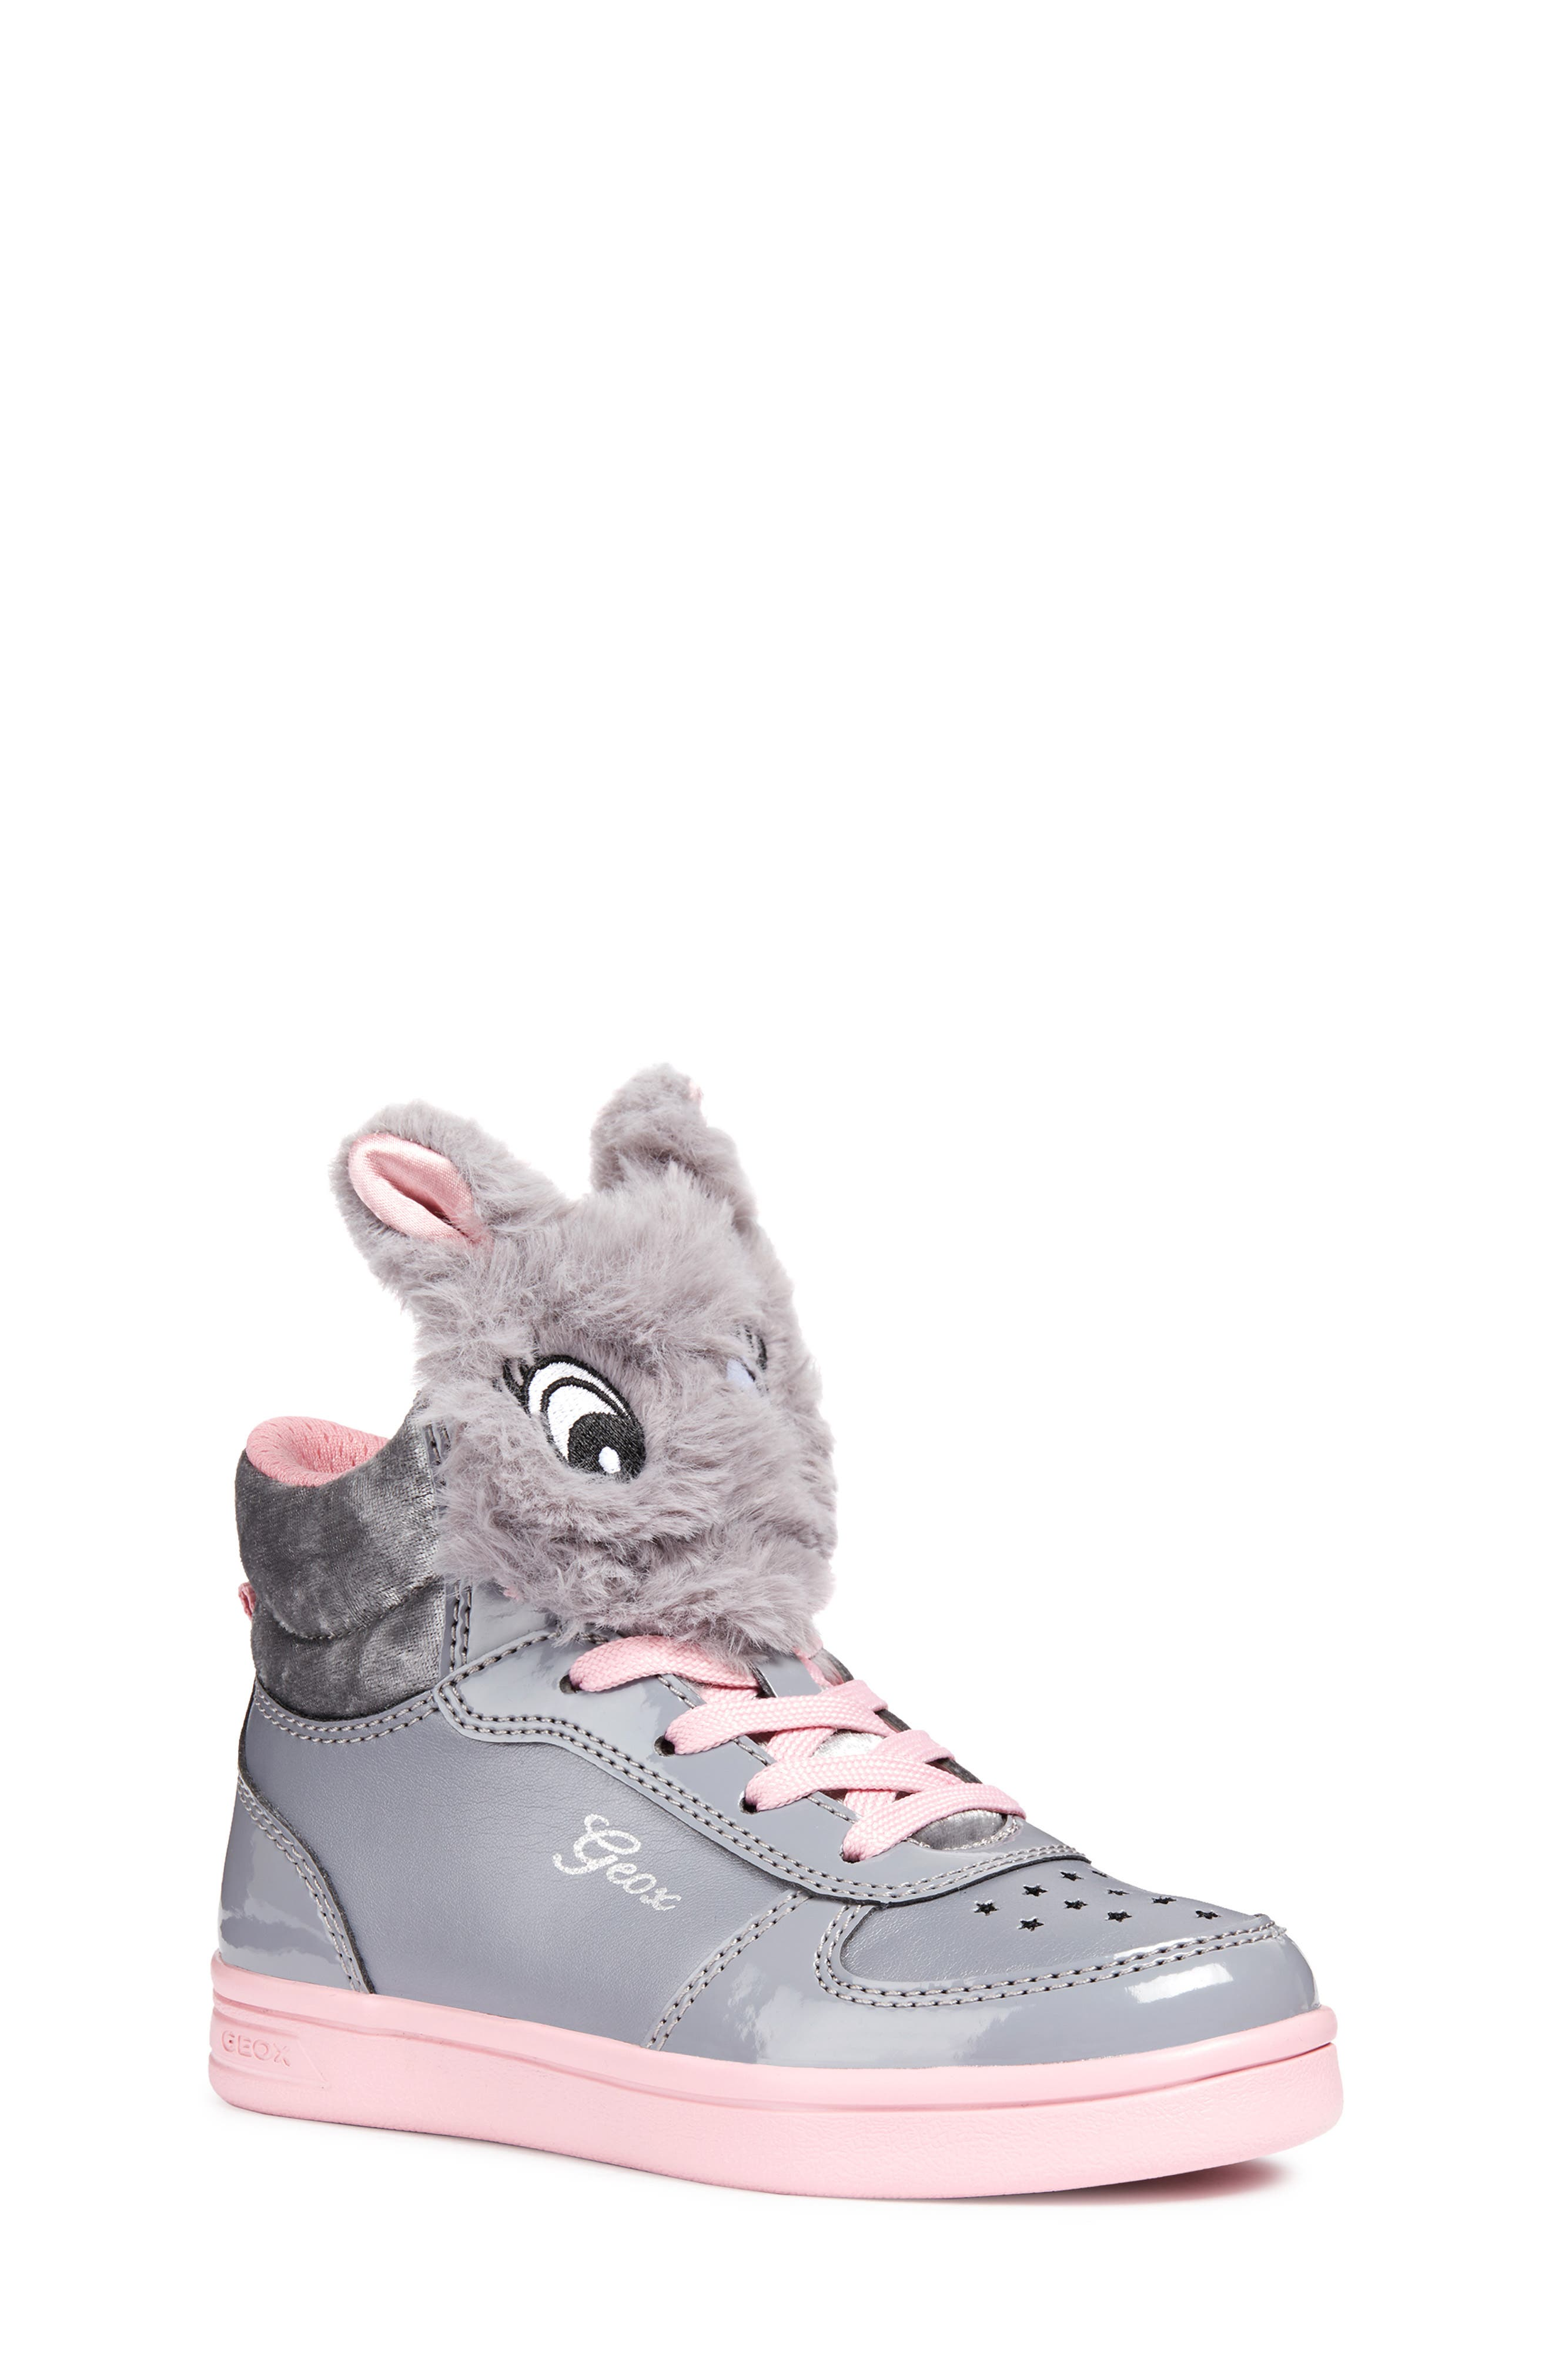 DJ Rock Fuzzy Friend Sneaker,                             Main thumbnail 1, color,                             GREY/PINK